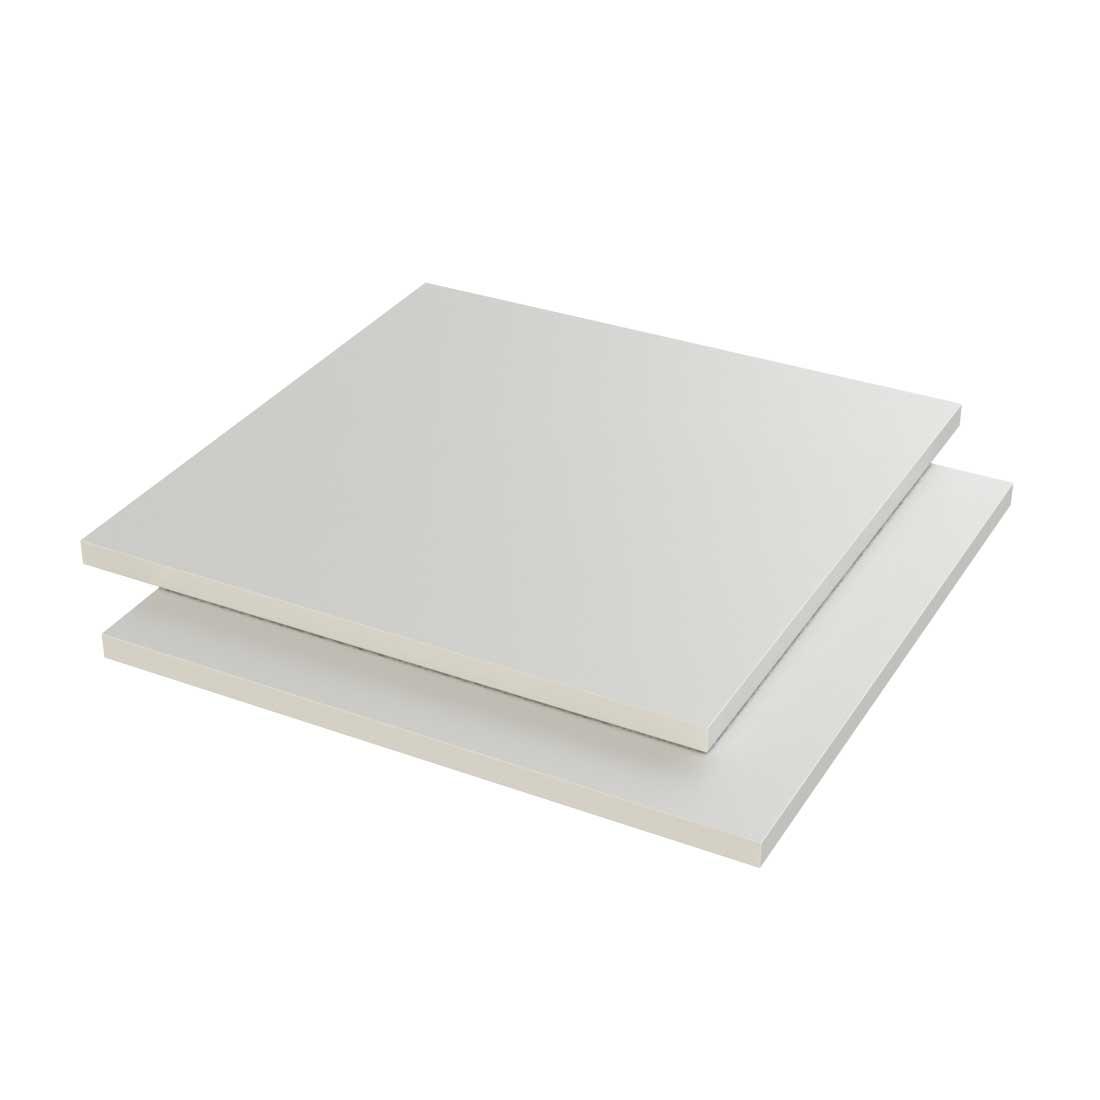 Vikureen PS Plaat Mat/mat Wit 900 1400x1000x0,5mm